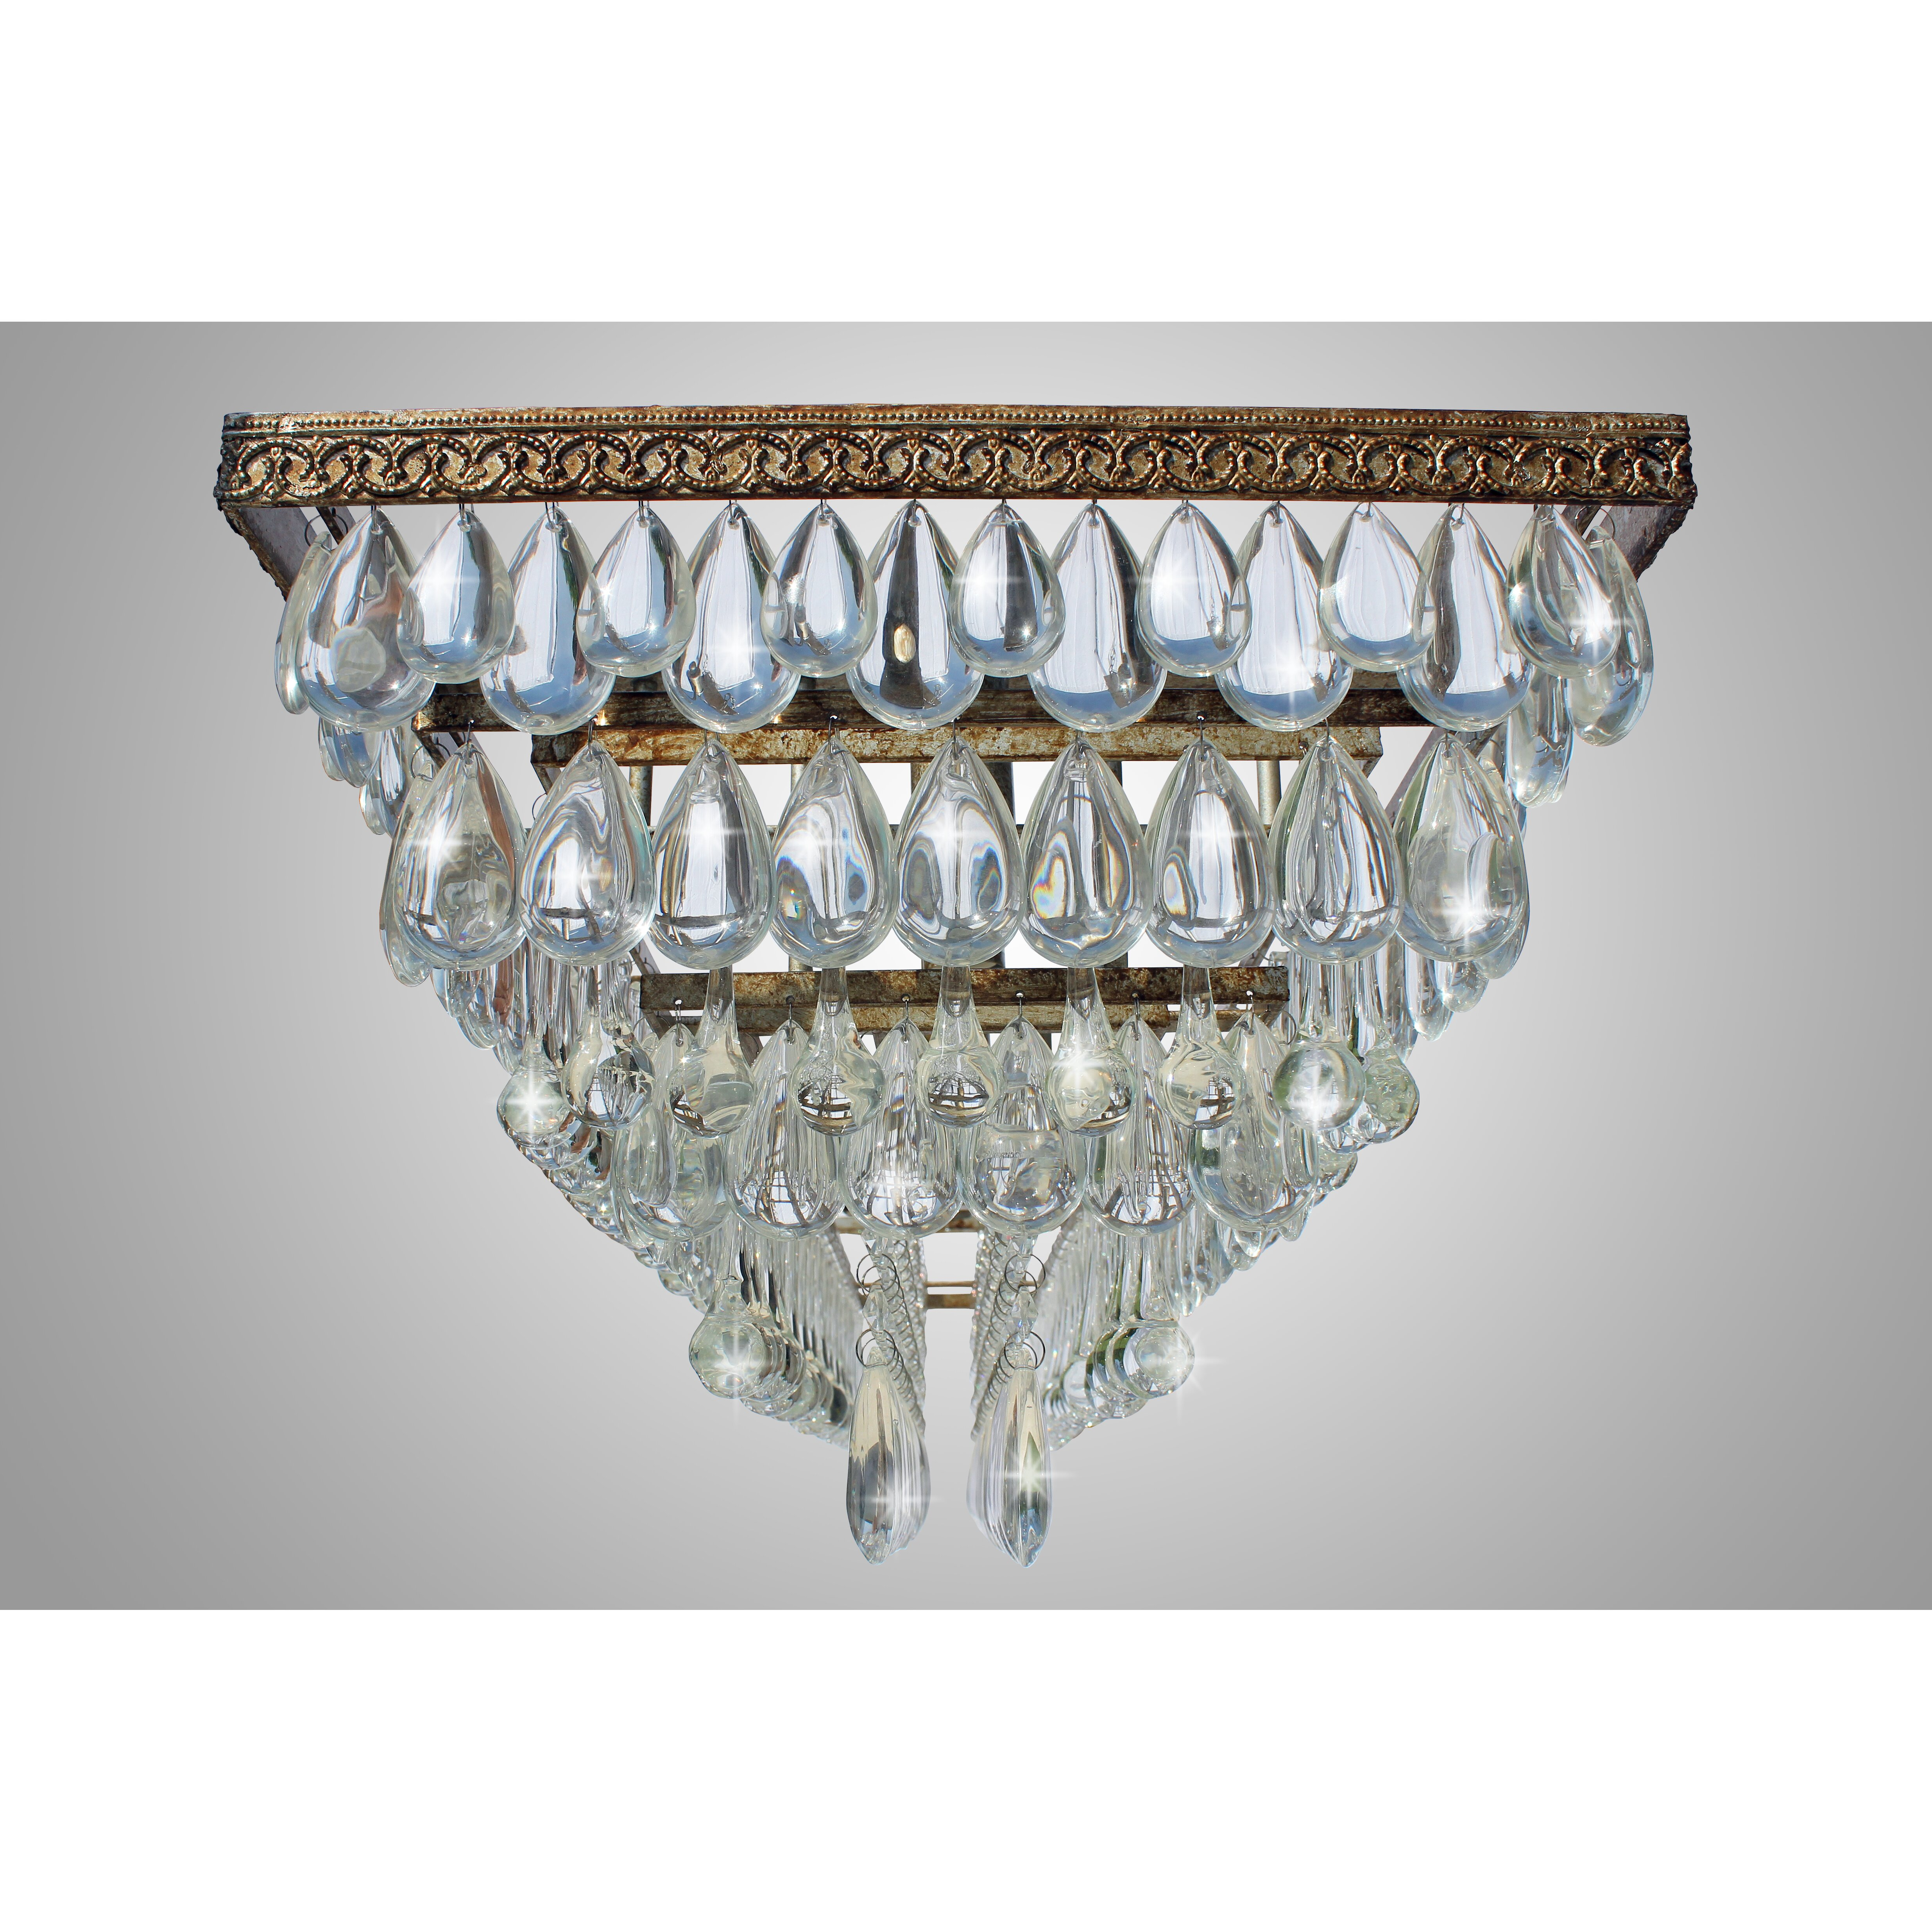 Lightupmyhome the weston 6 light crystal chandelier for 6 light crystal chandelier